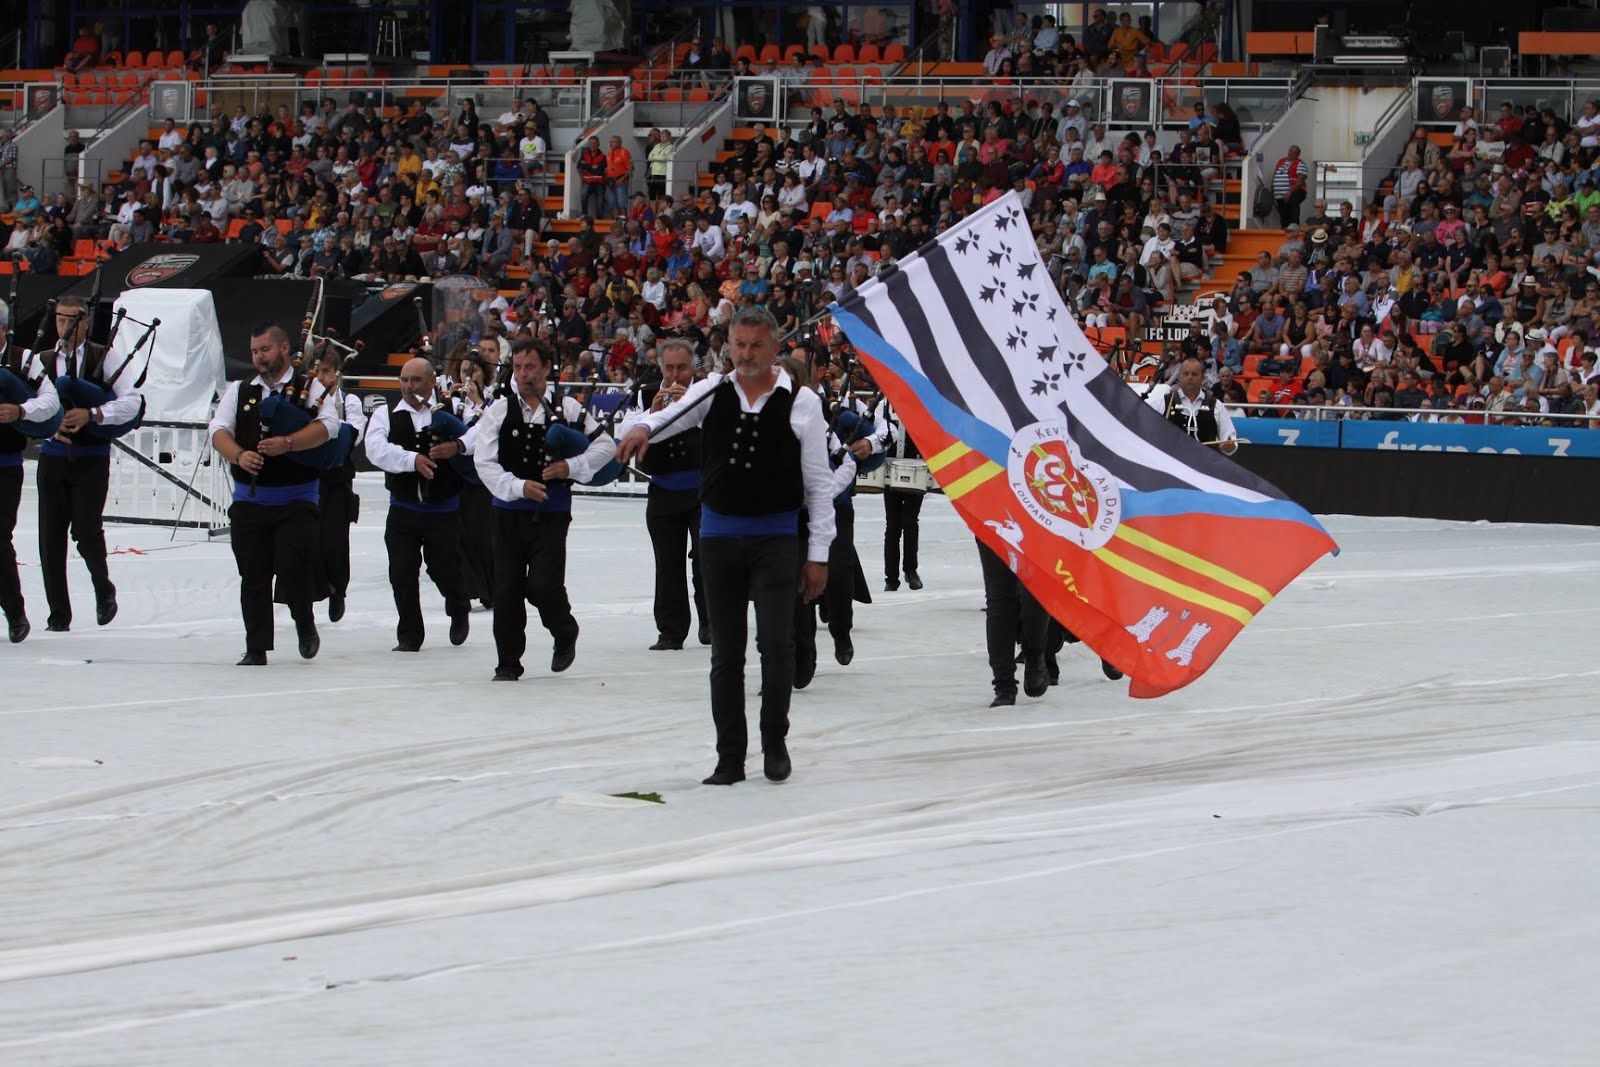 Grande Parade Lorient FIL 2019